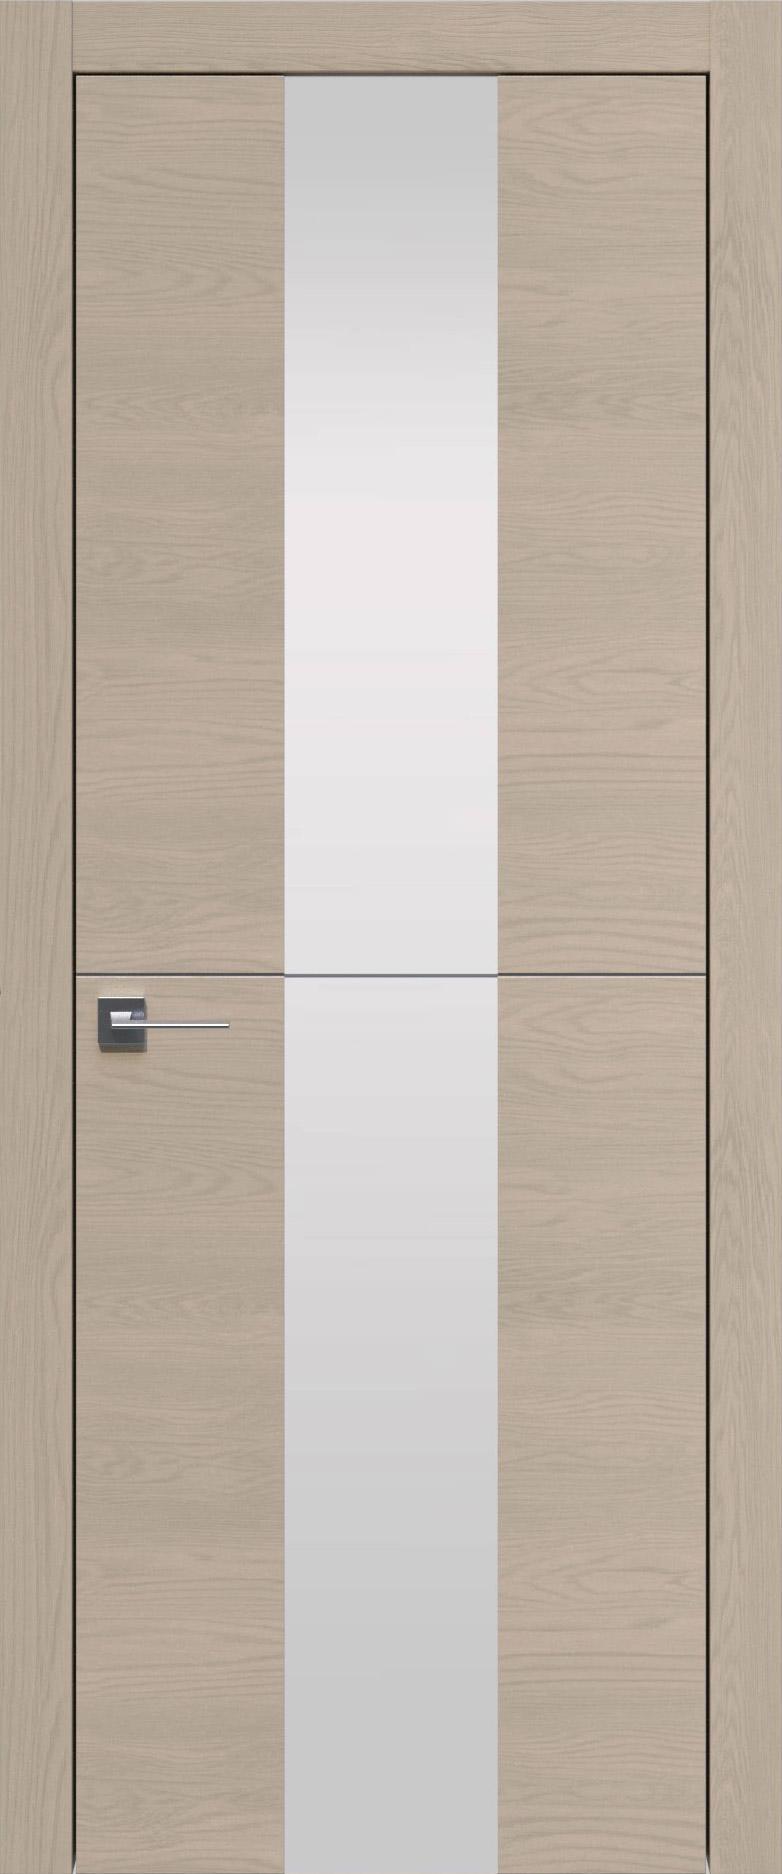 Tivoli Ж-3 цвет - Дуб муар Со стеклом (ДО)